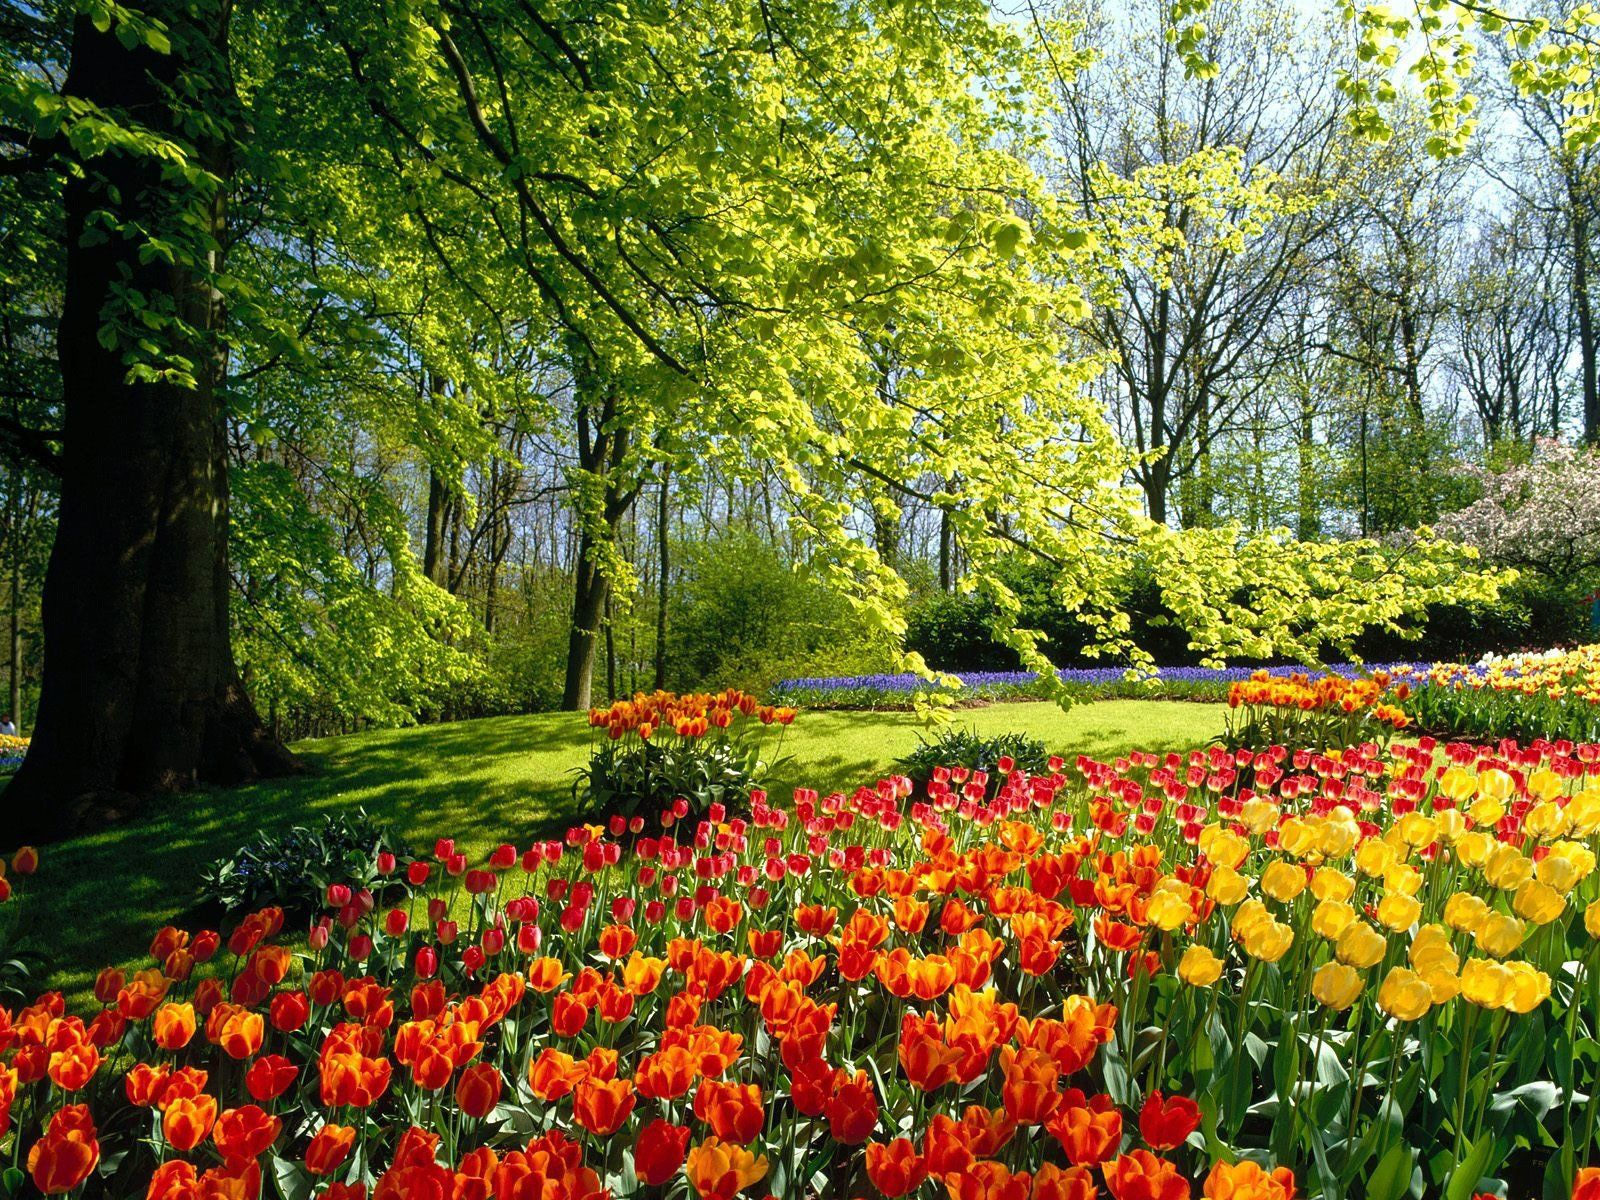 screensavers wallpaper tulip field